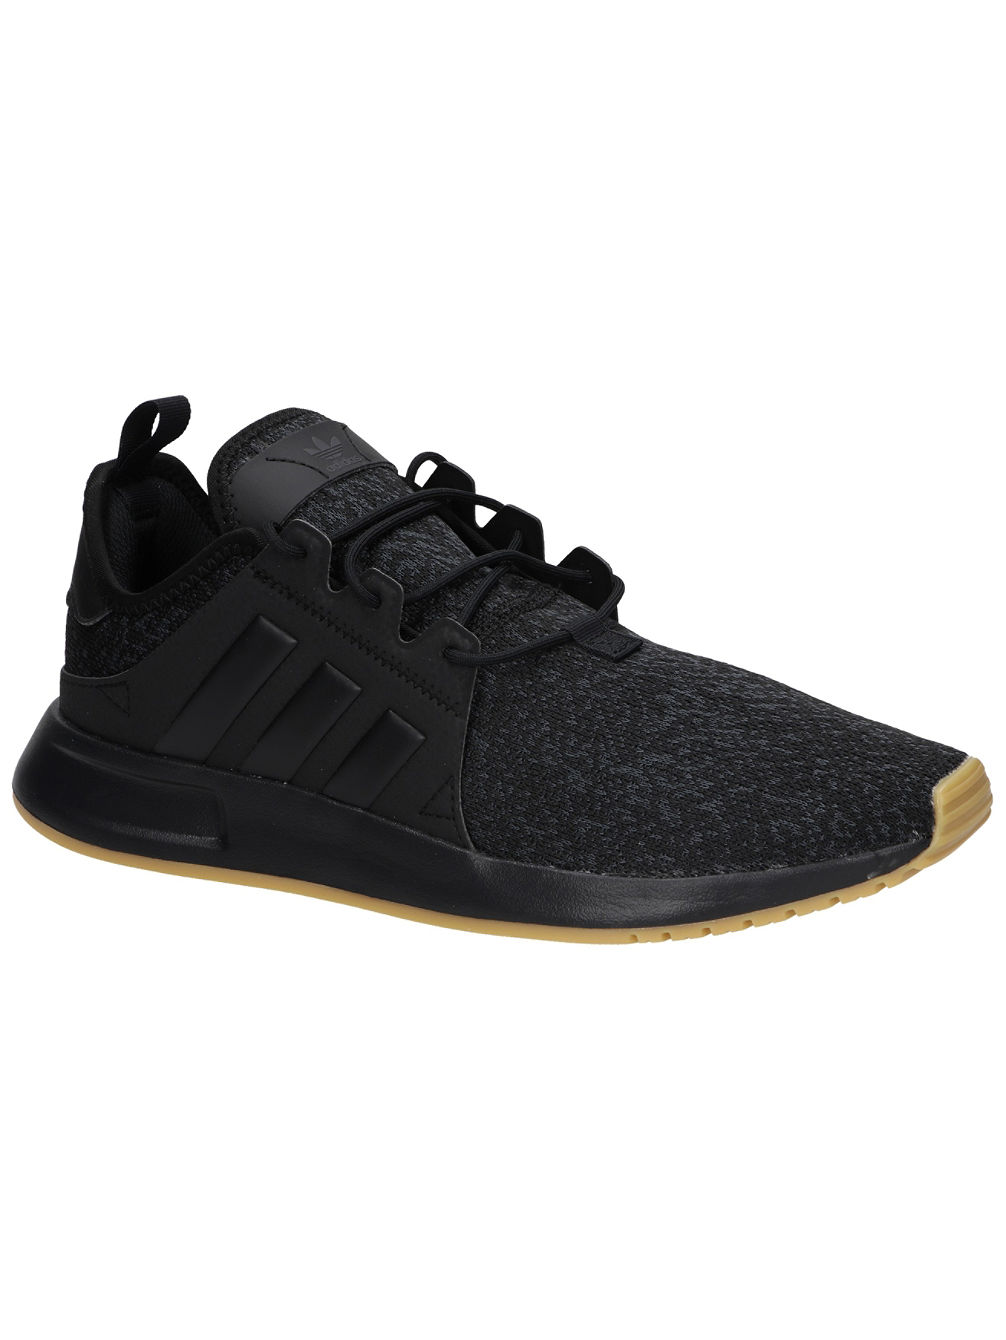 2767c6e65a2 Buy adidas Originals X PLR Sneakers online at blue-tomato.com